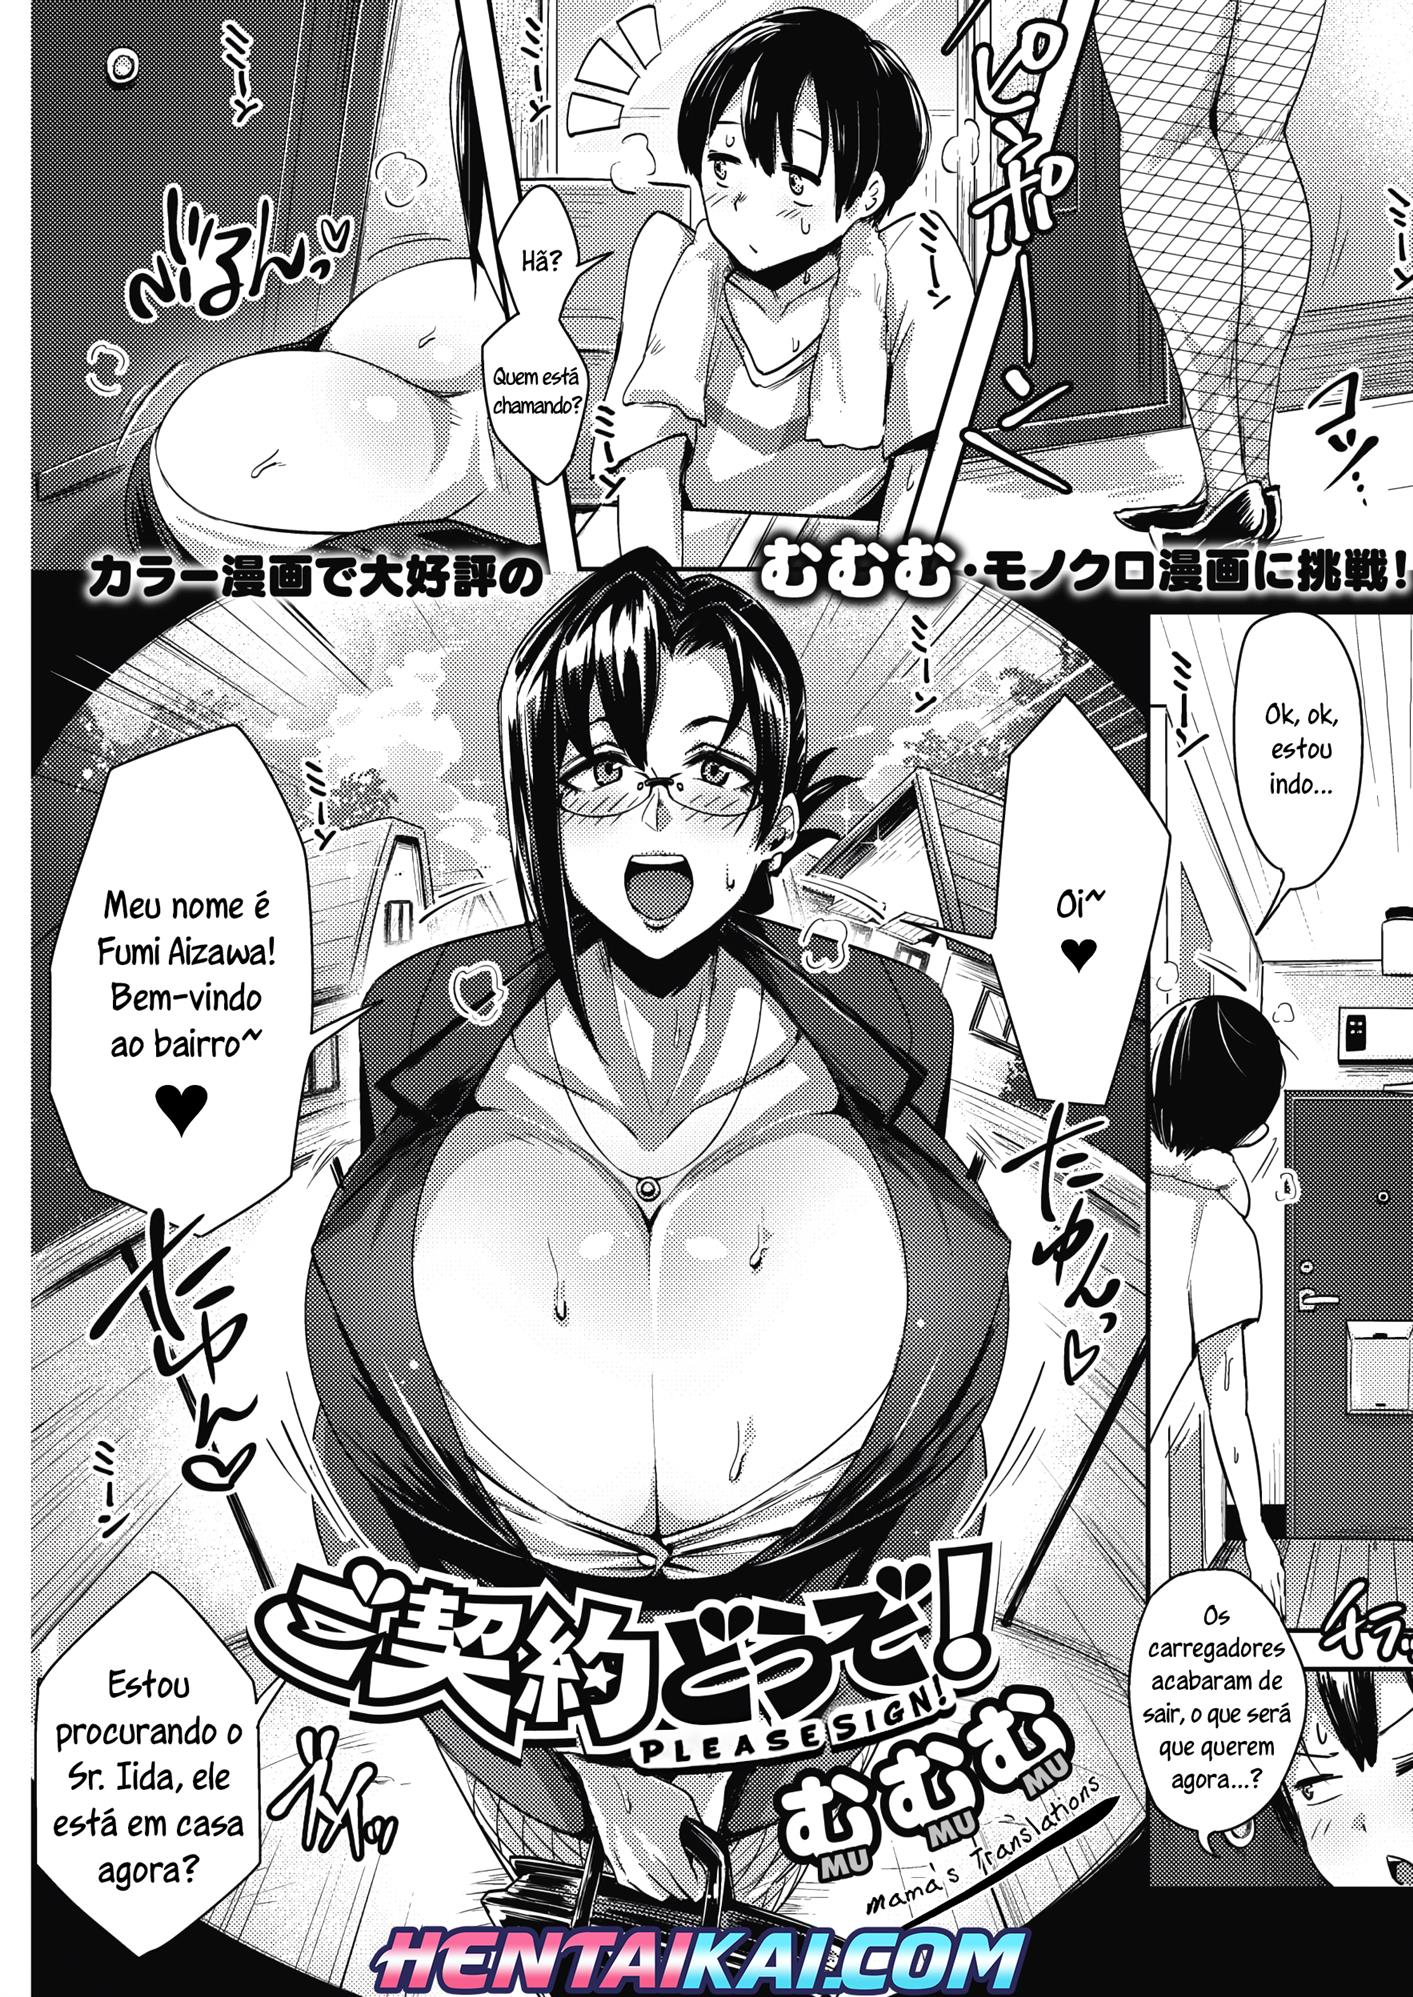 Gokeiyaku Douzo!